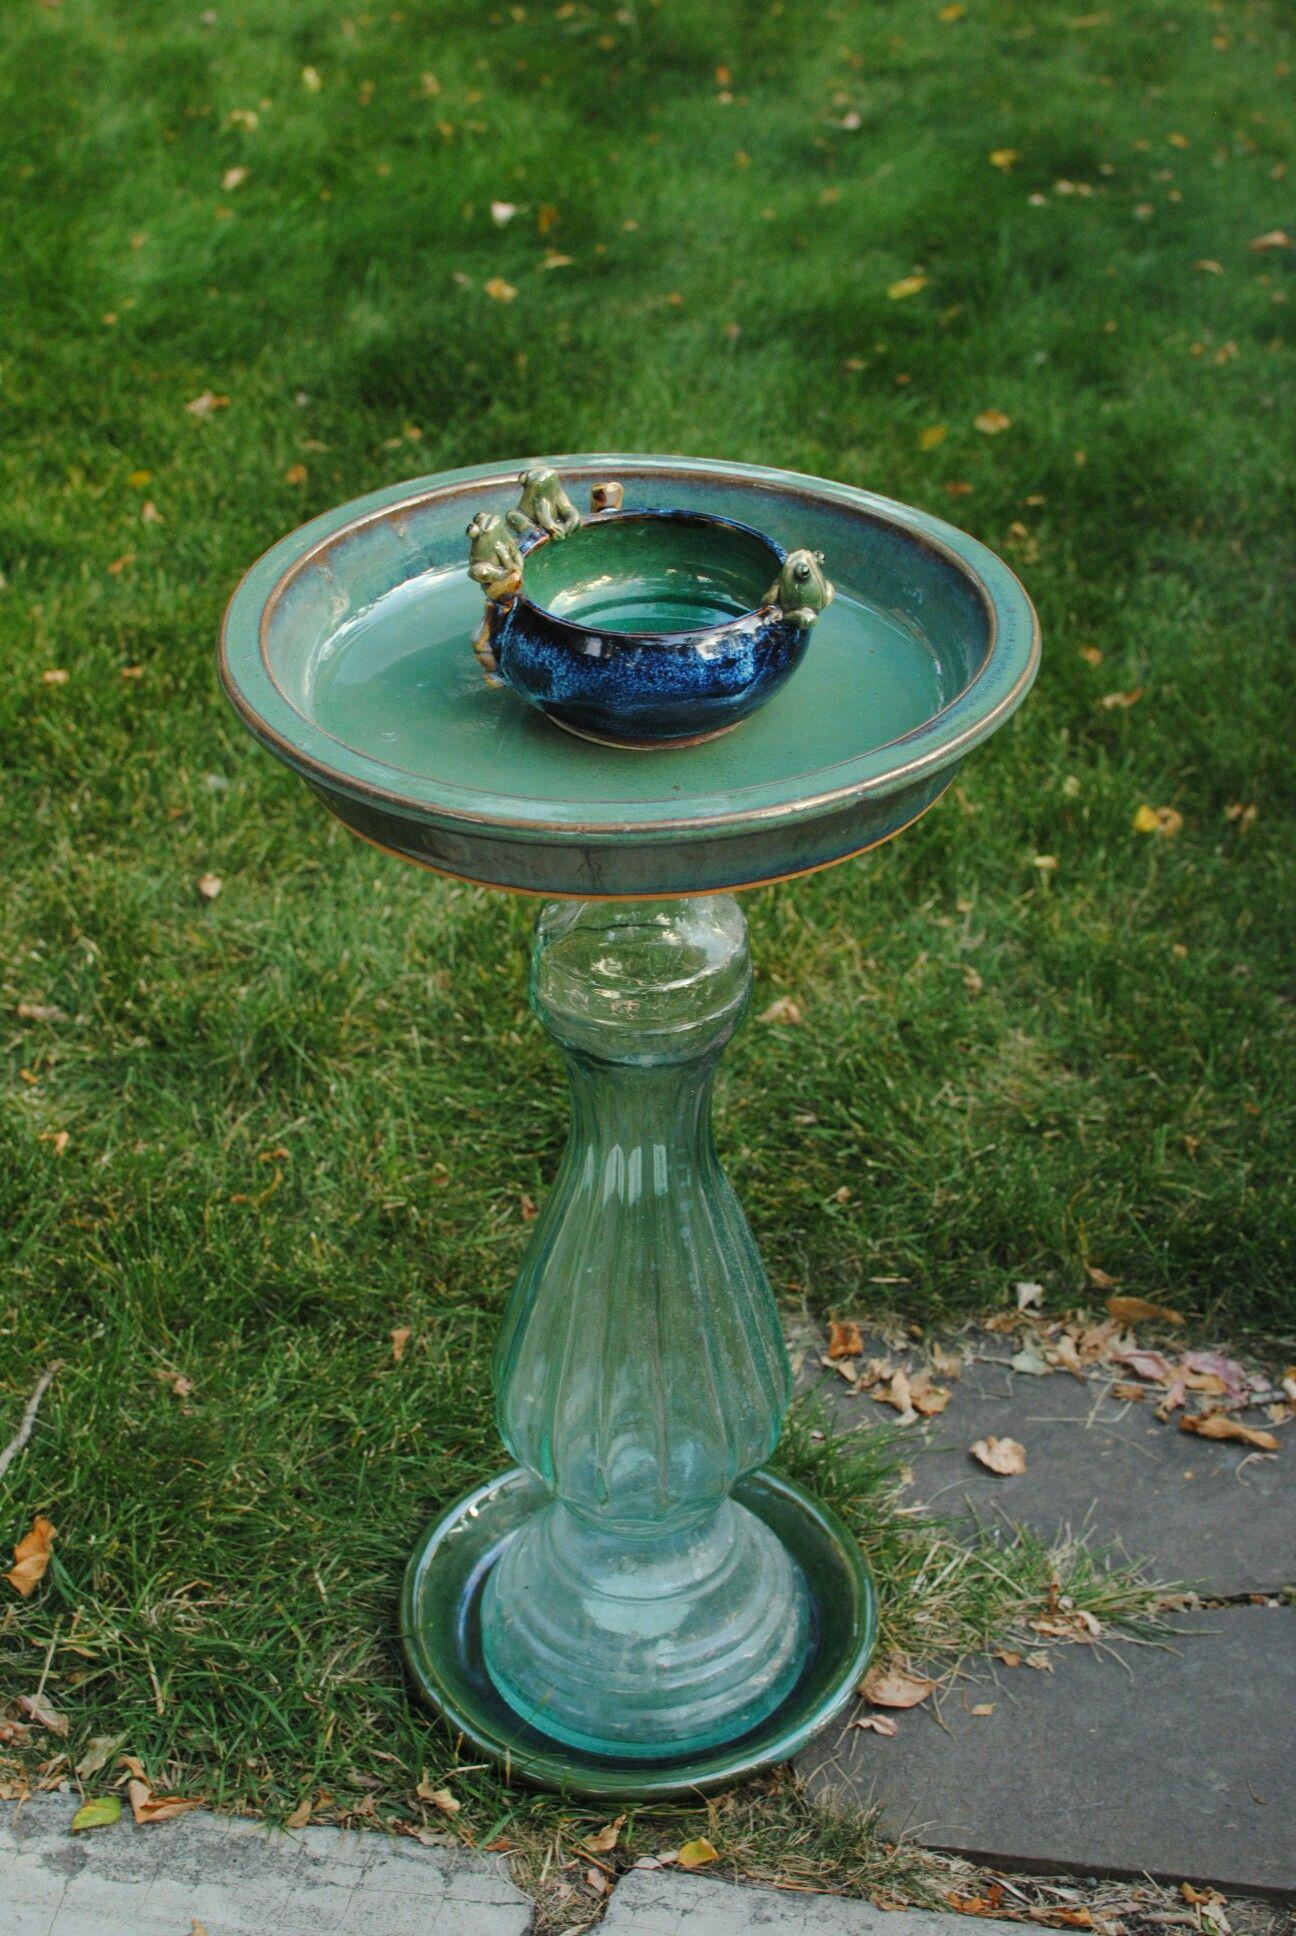 Upcycled garden bird feeder or shallow bird bath. Check us out on ...